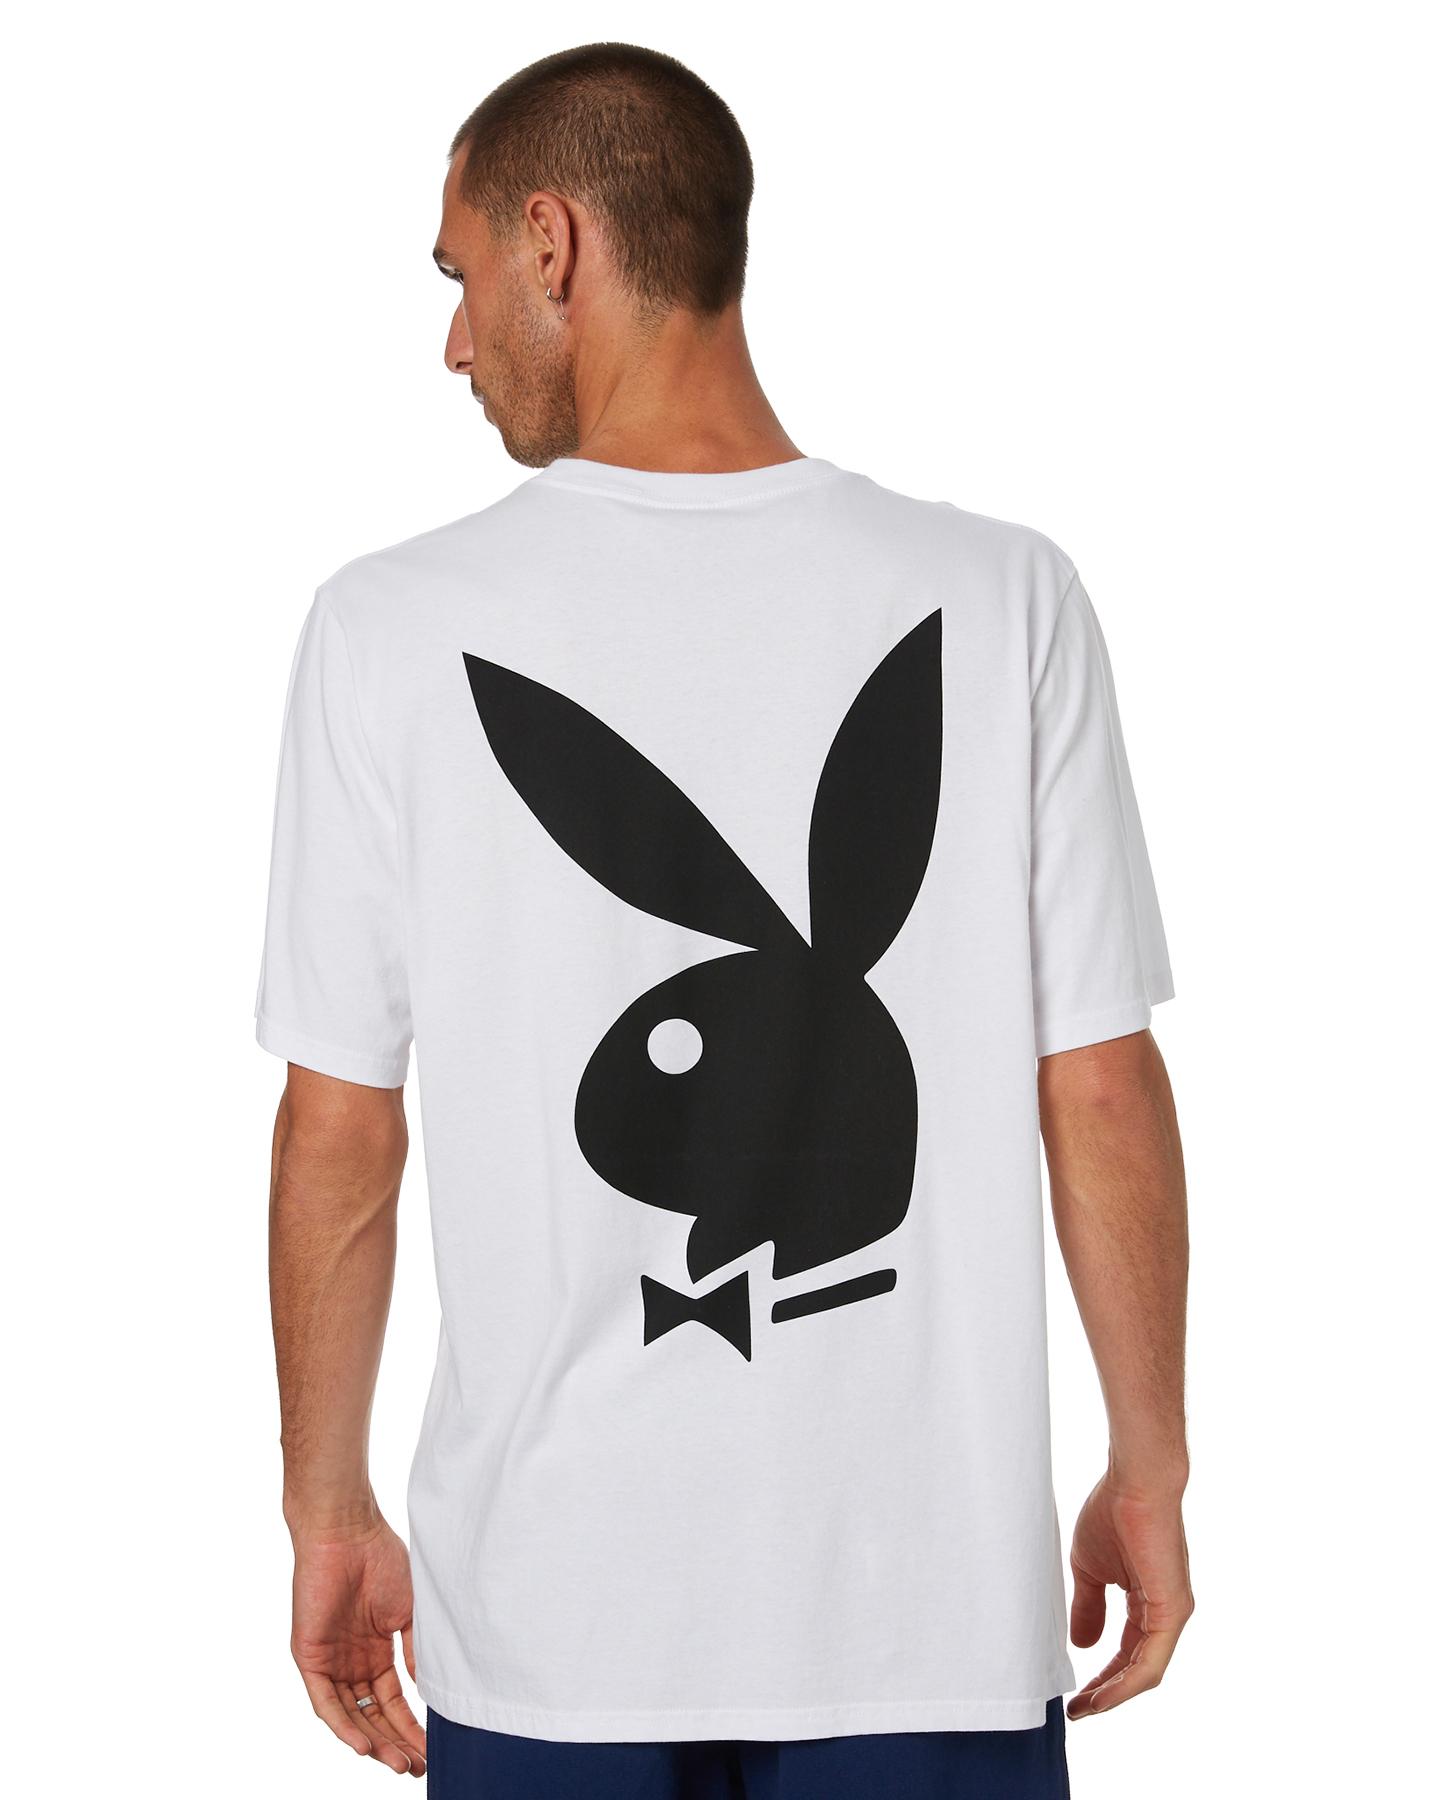 Playboy Playboy Logo Mens Ss Tee White